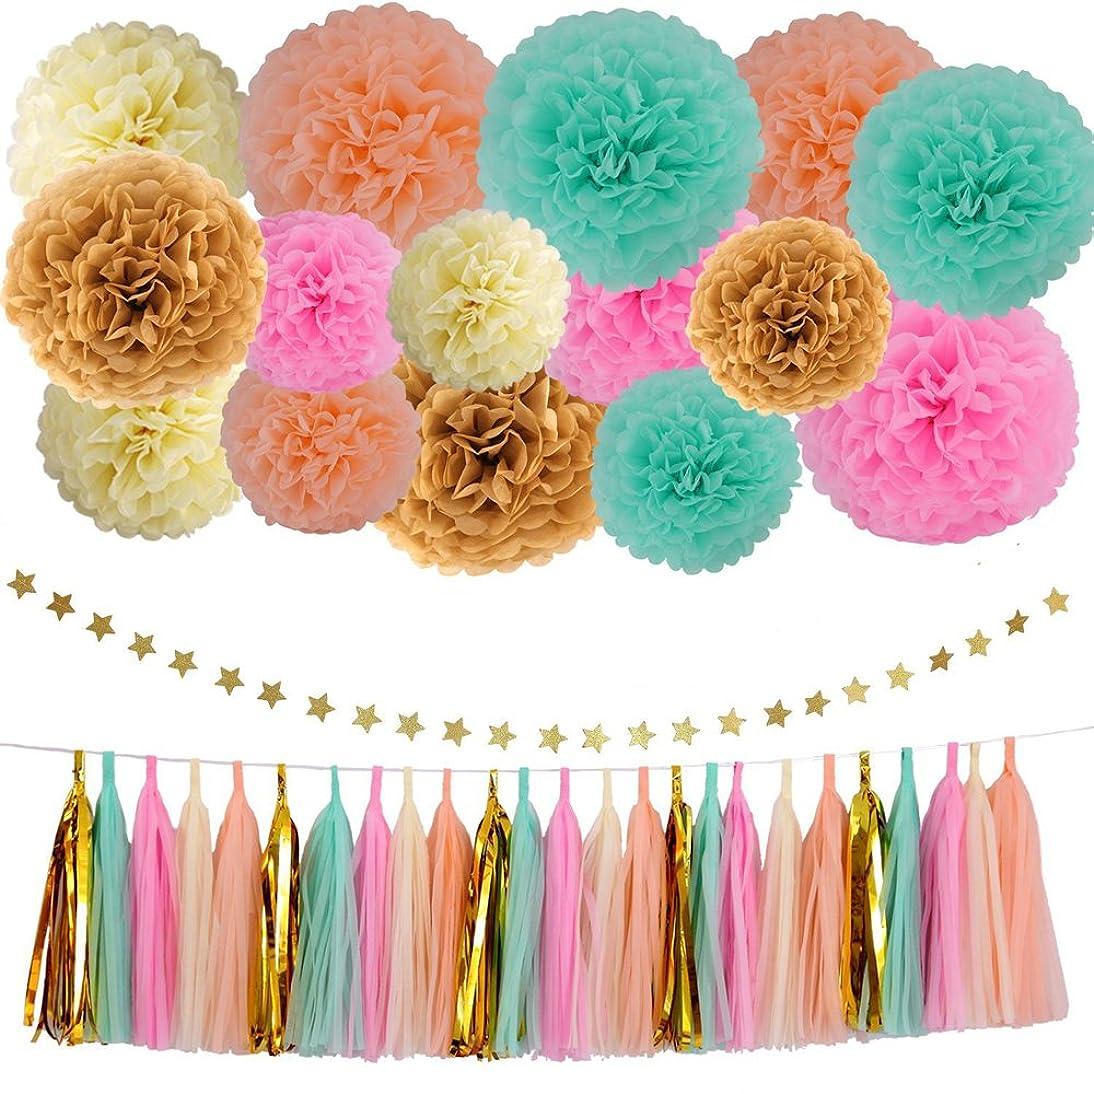 Gift Prod Art Tissue Mint Gold Peach Cream Tissue Pom Poms 41 Pcs Paper Flowers Tissue Tassel Paper Garland Kit 15 Pcs Tissue Paper 25 Pcs Tissue Tassel 1 Pcs Five-pointed Star Paper (Style 1)